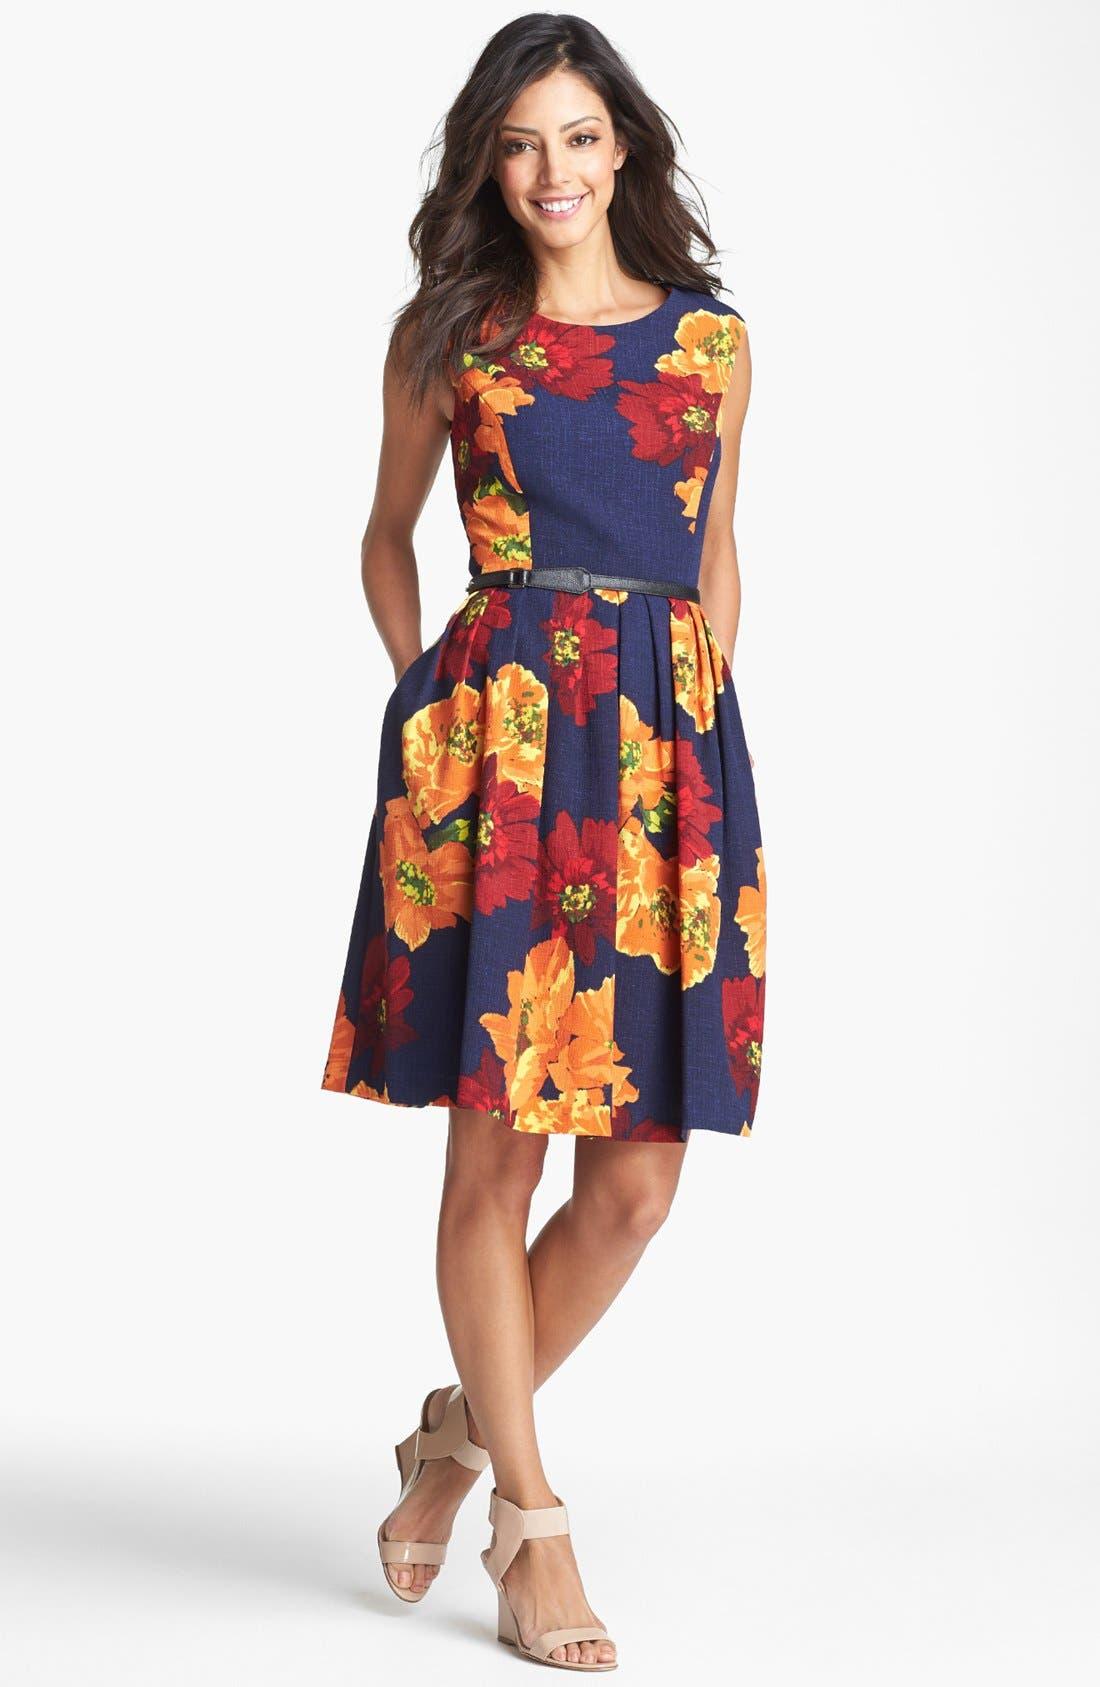 Alternate Image 1 Selected - Ellen Tracy Print Sleeveless Fit & Flare Dress